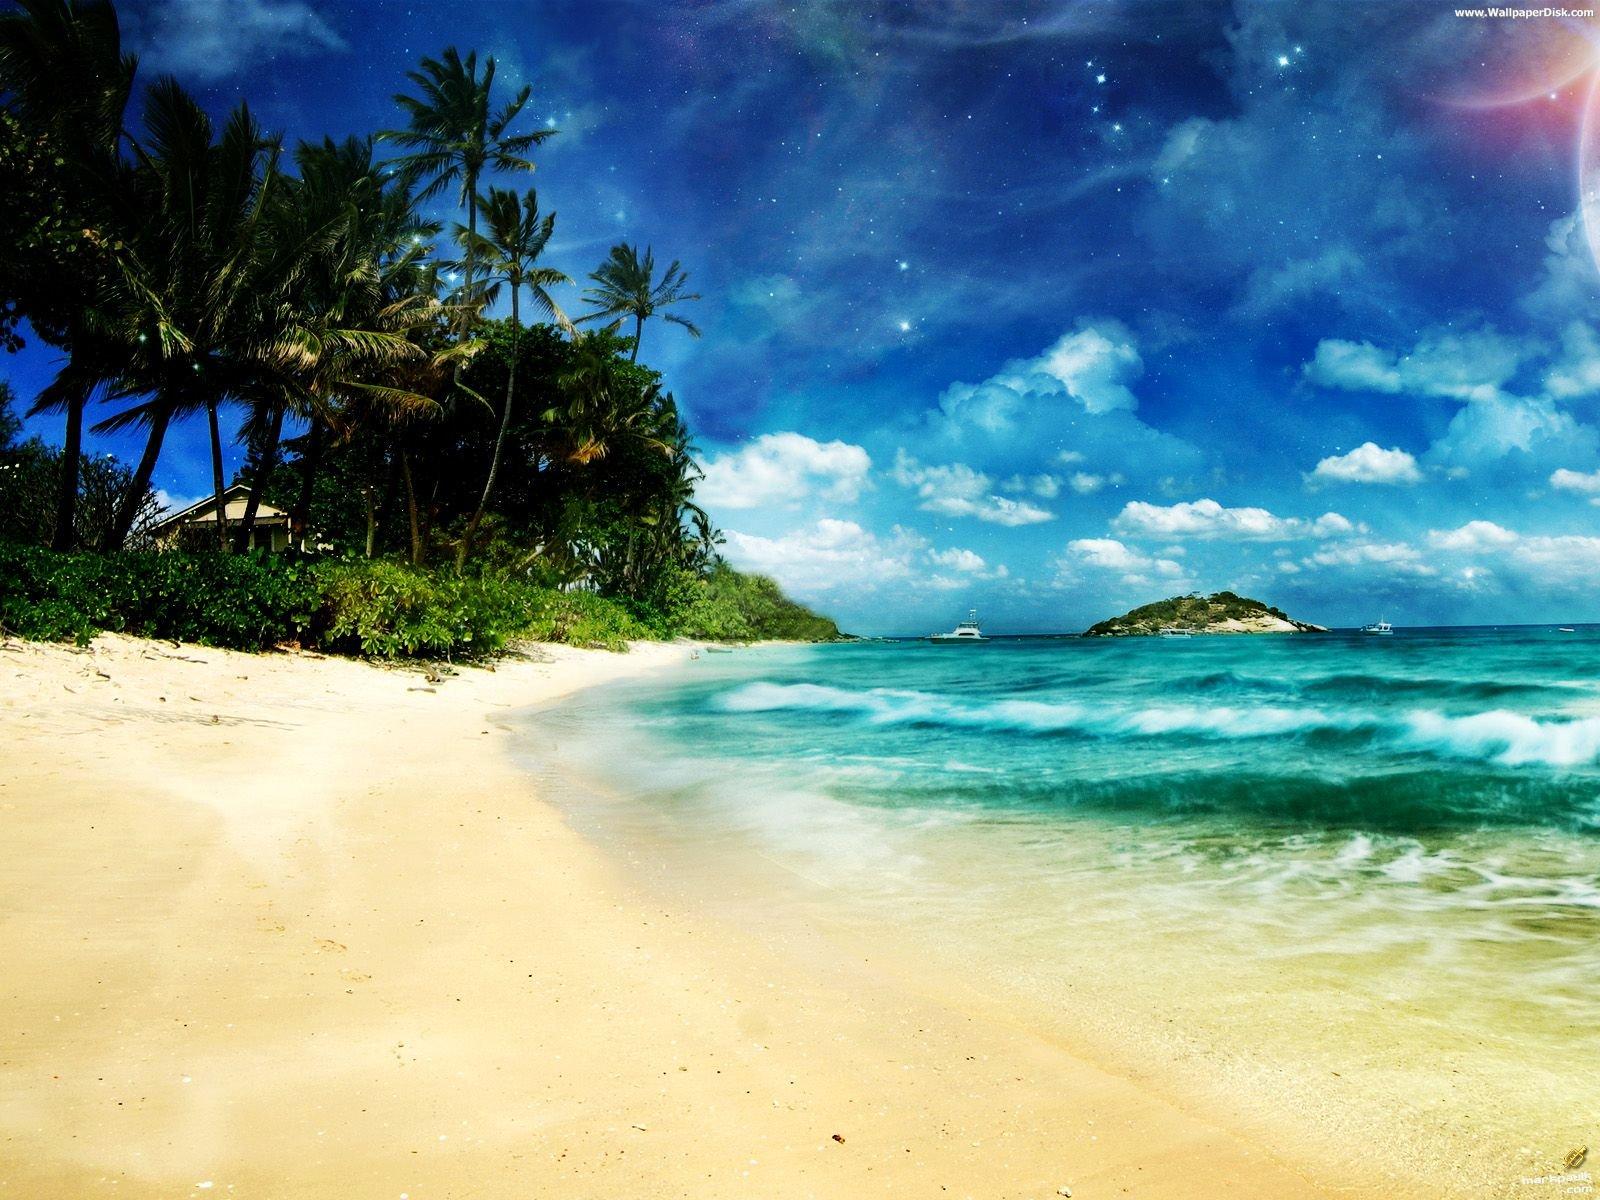 Download ocean beach Wallpaper 1600x1200